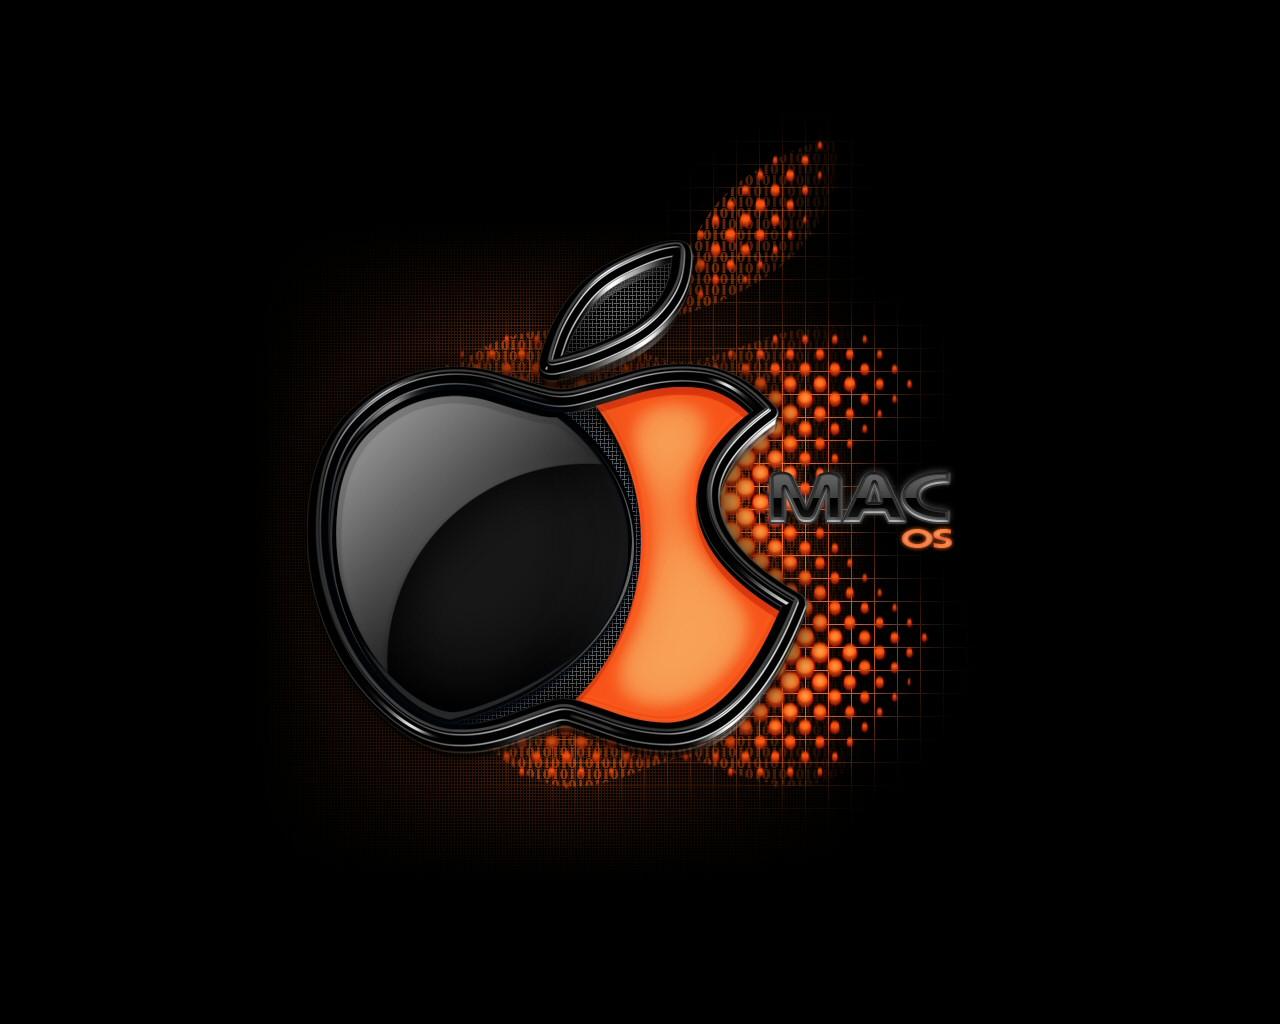 apple wallpaper | hd wallpapers pulse